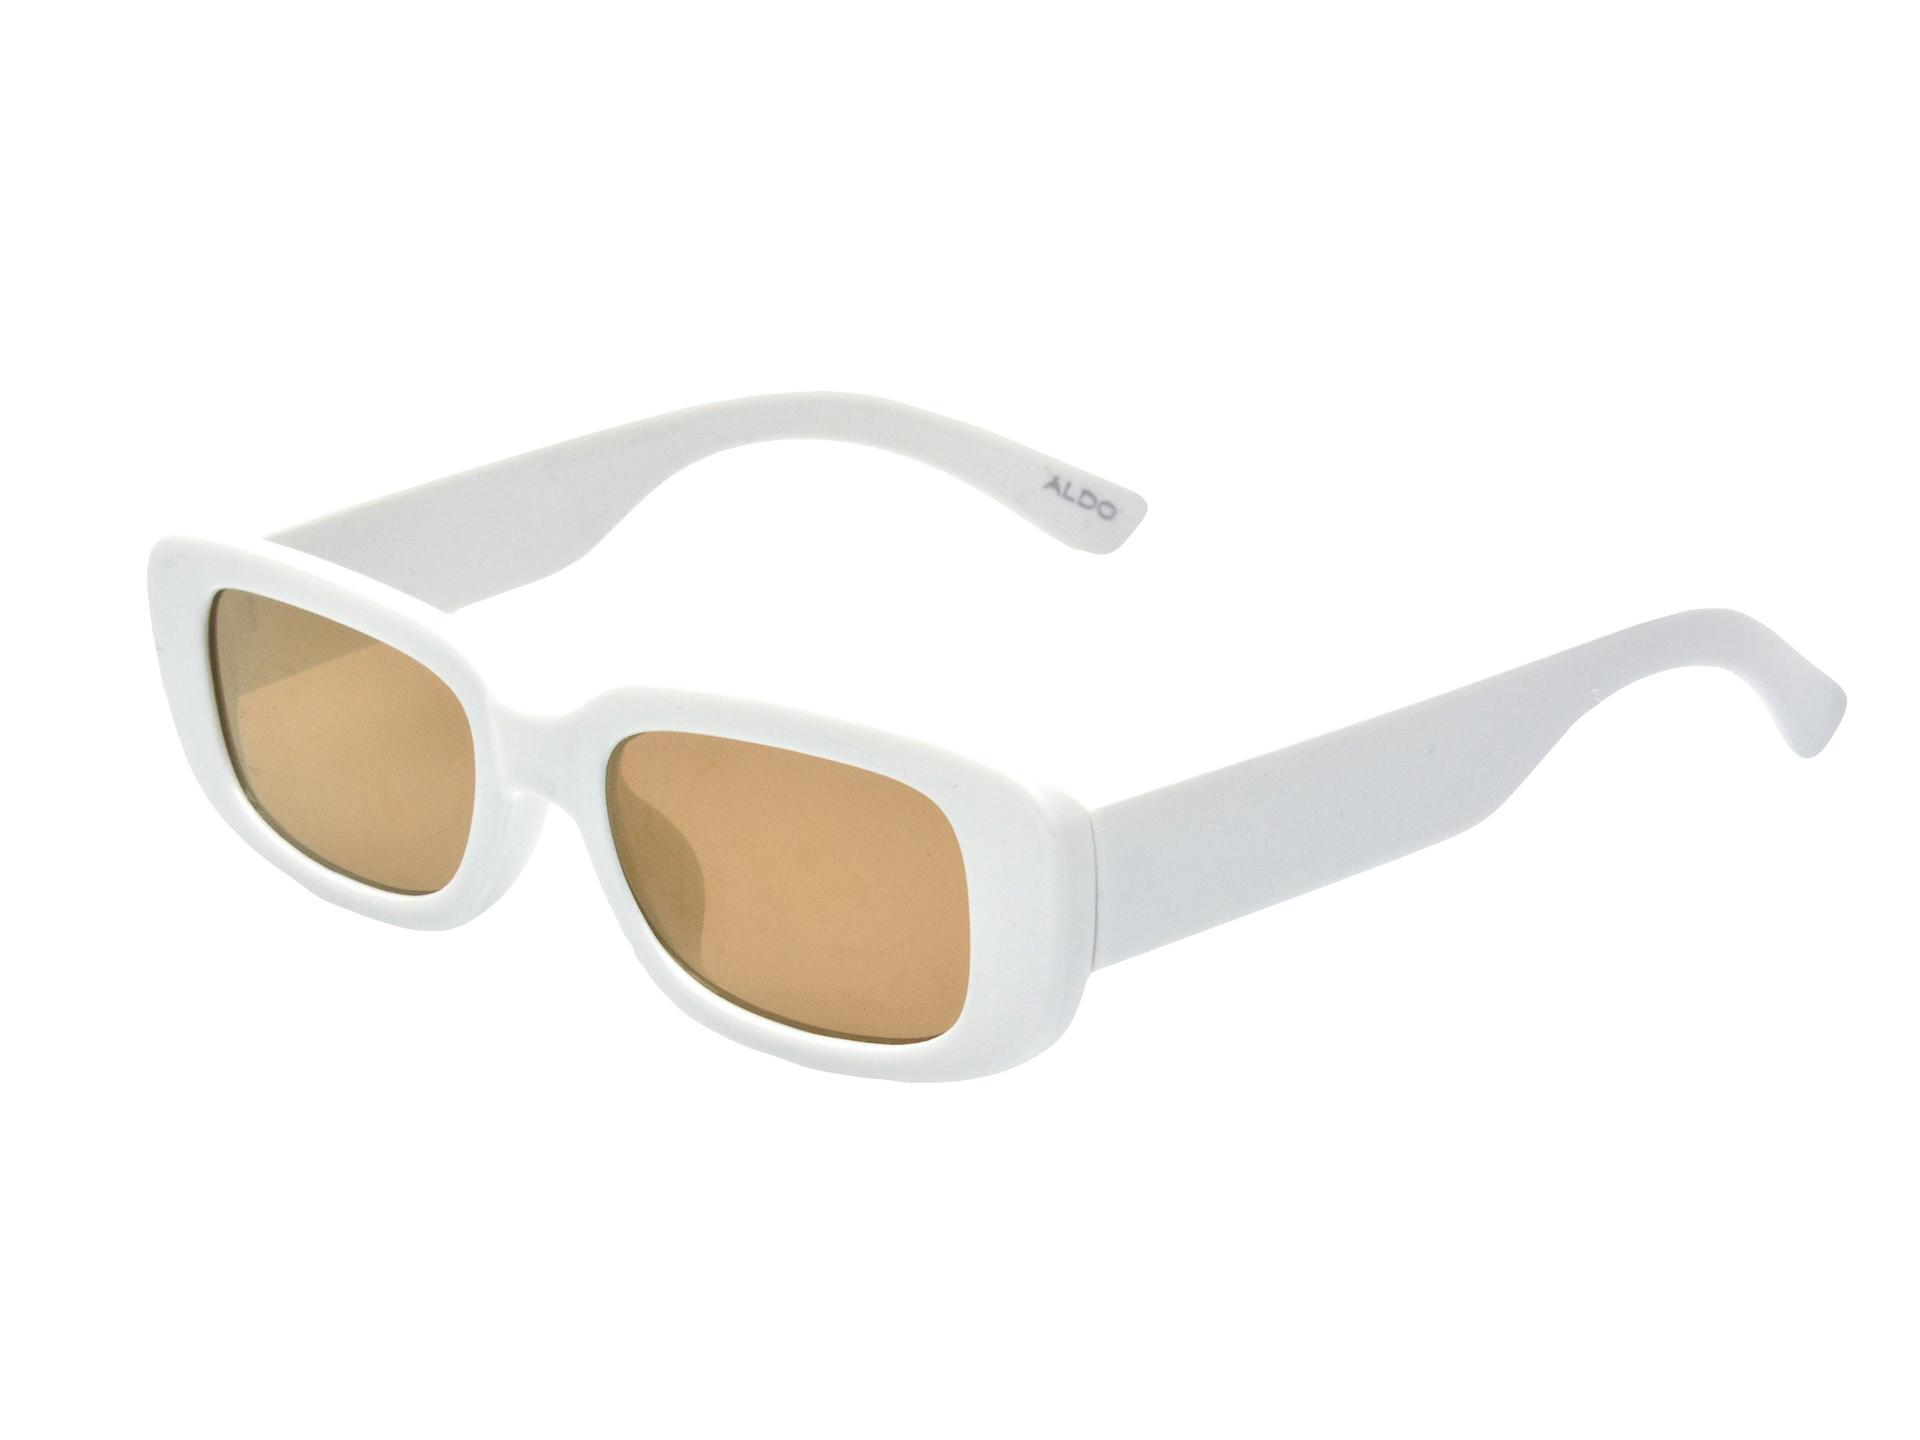 Ochelari de soare ALDO albi, Oloarwen100, din pvc imagine otter.ro 2021